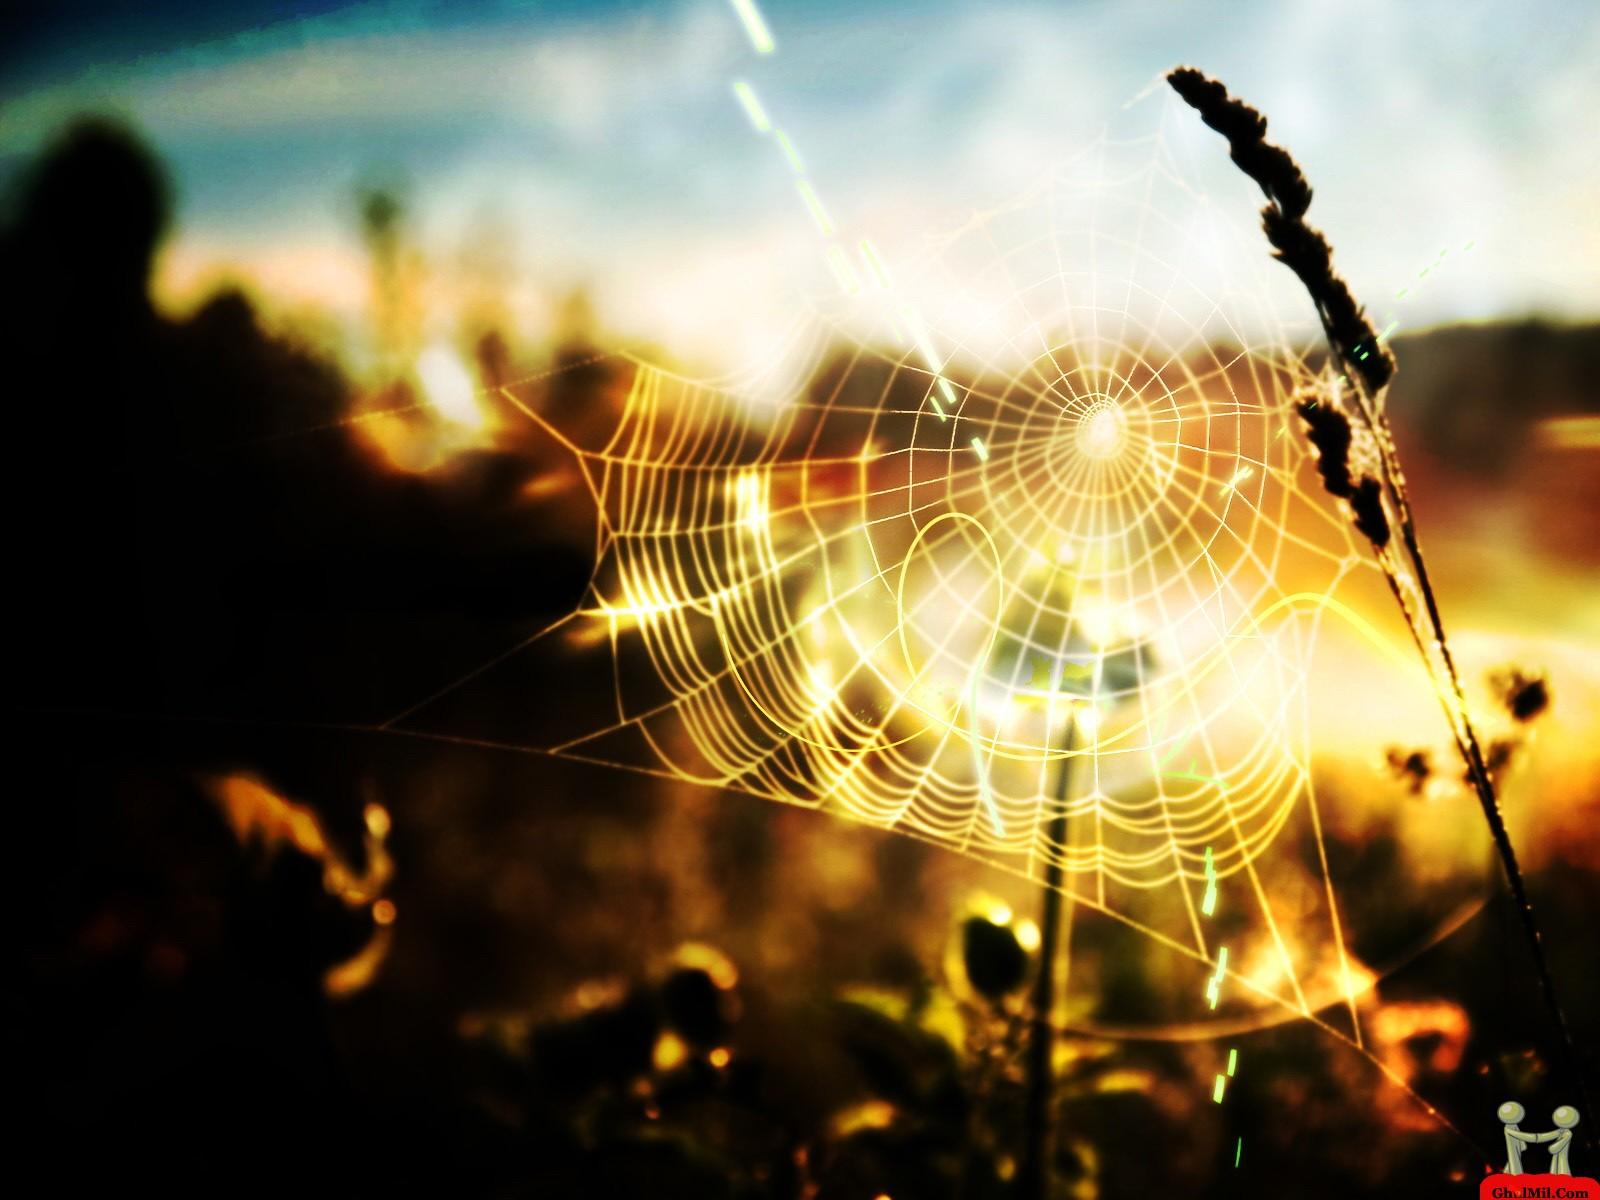 Natural Spider Web HD Wallpaper E Entertainment 1600x1200